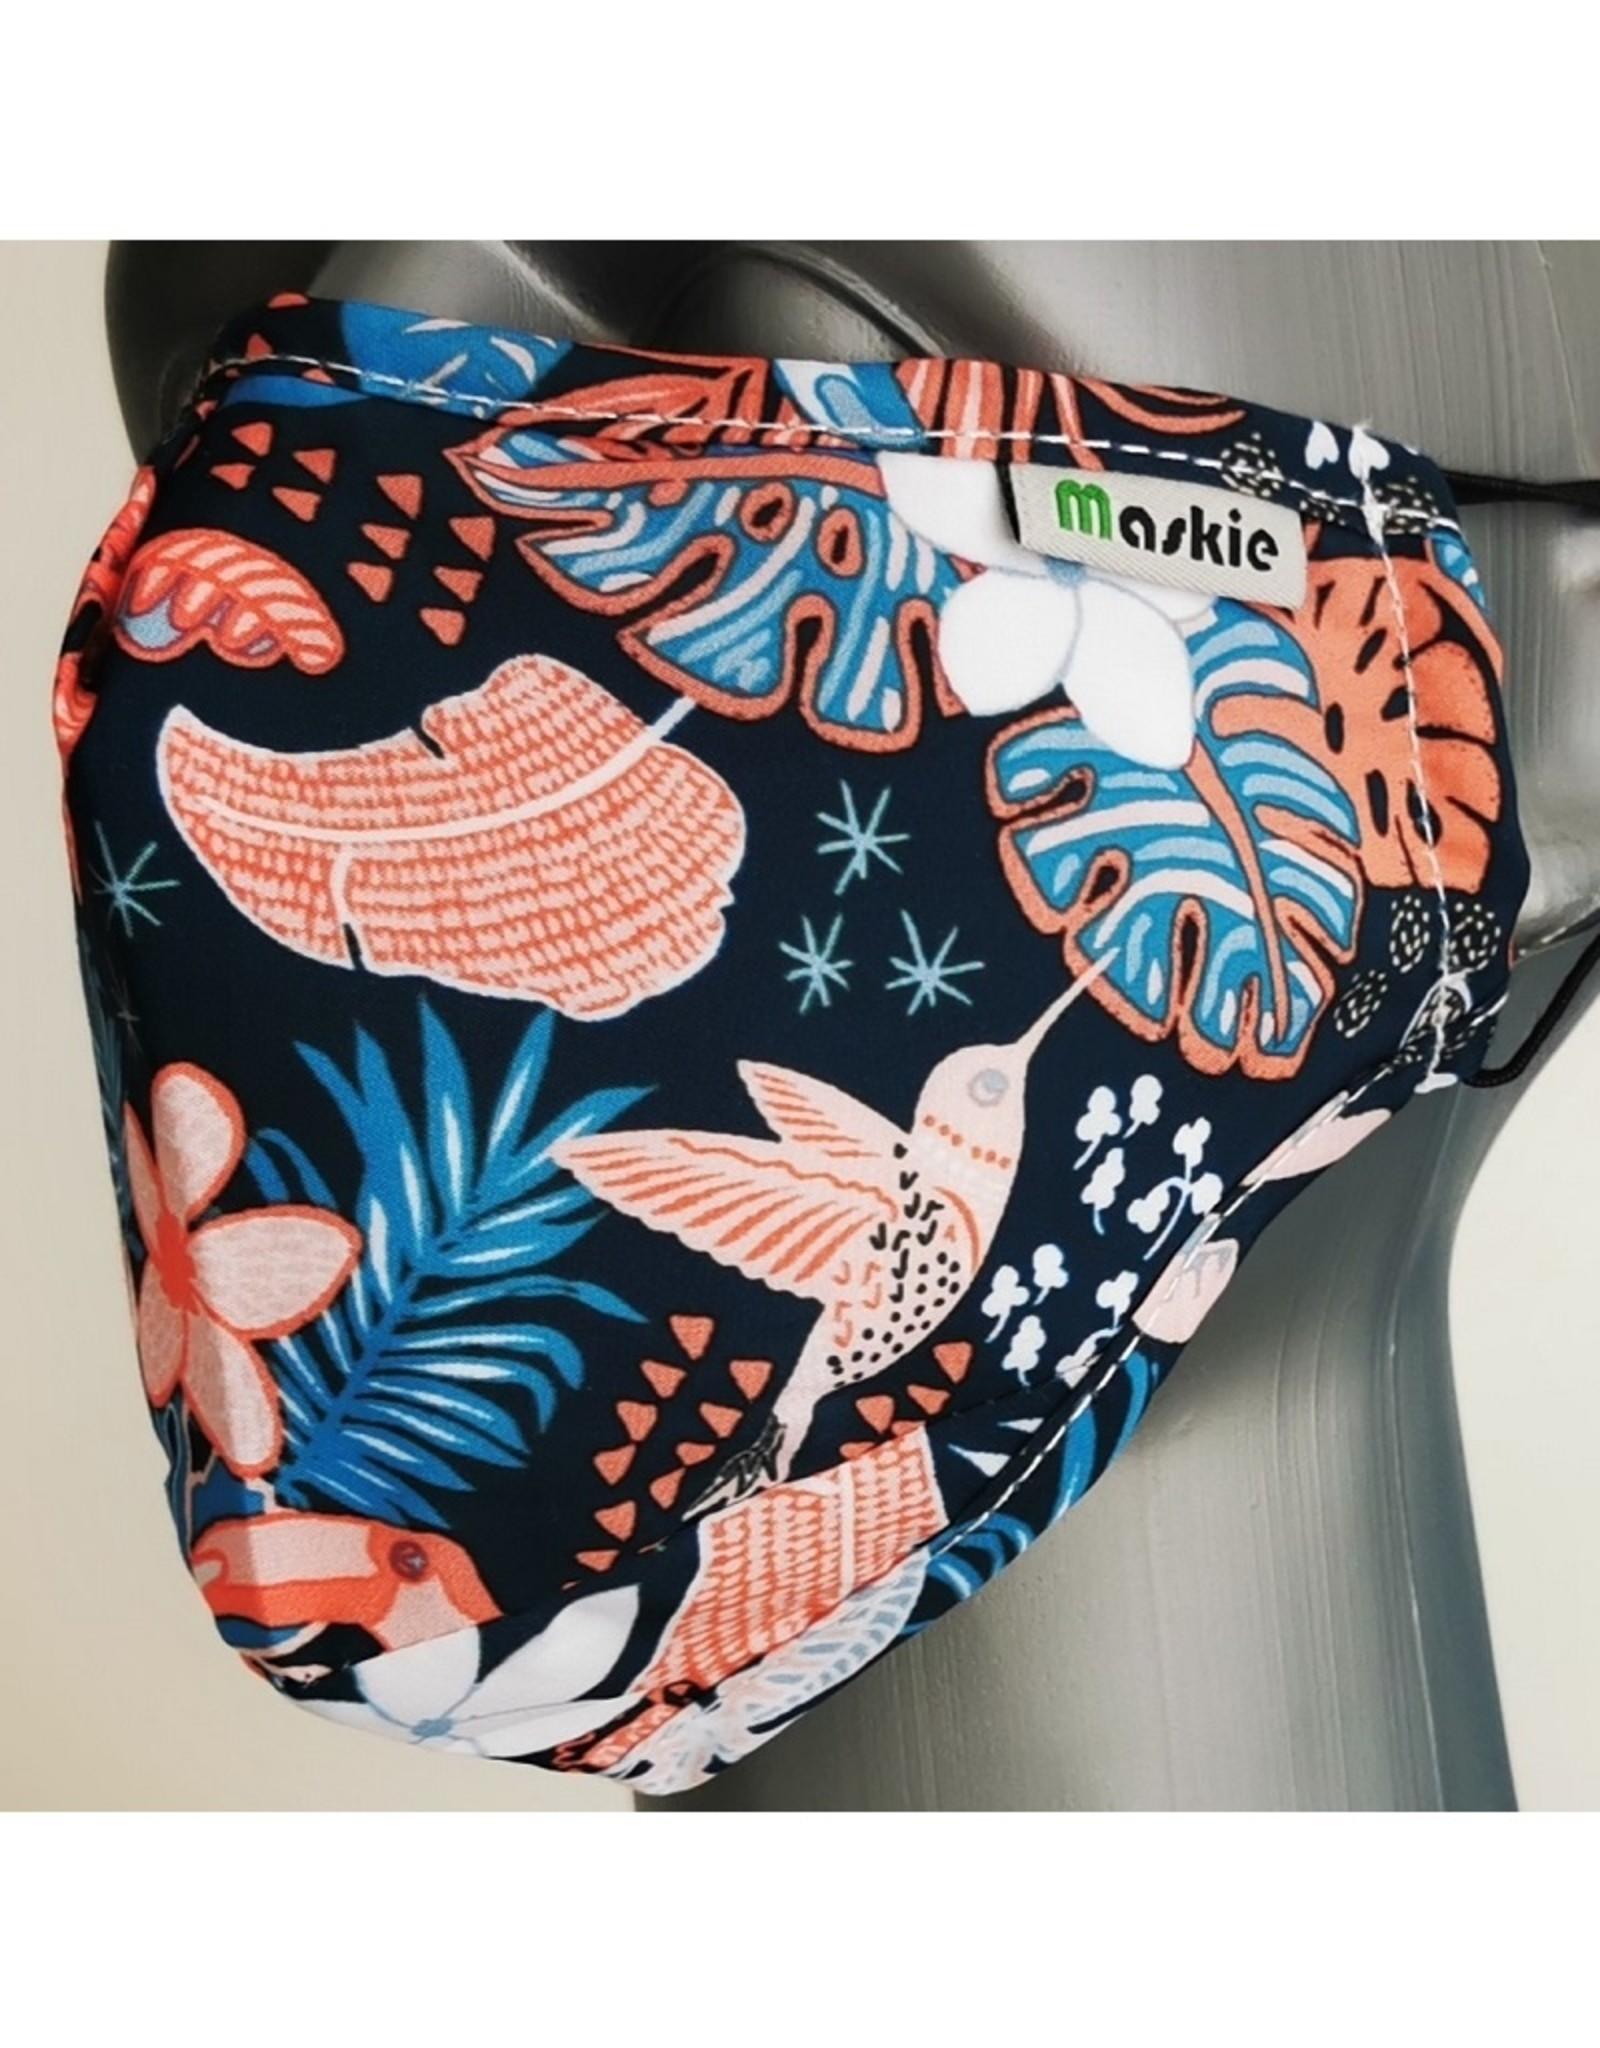 Maskie mondkapje: Jungle Vogels